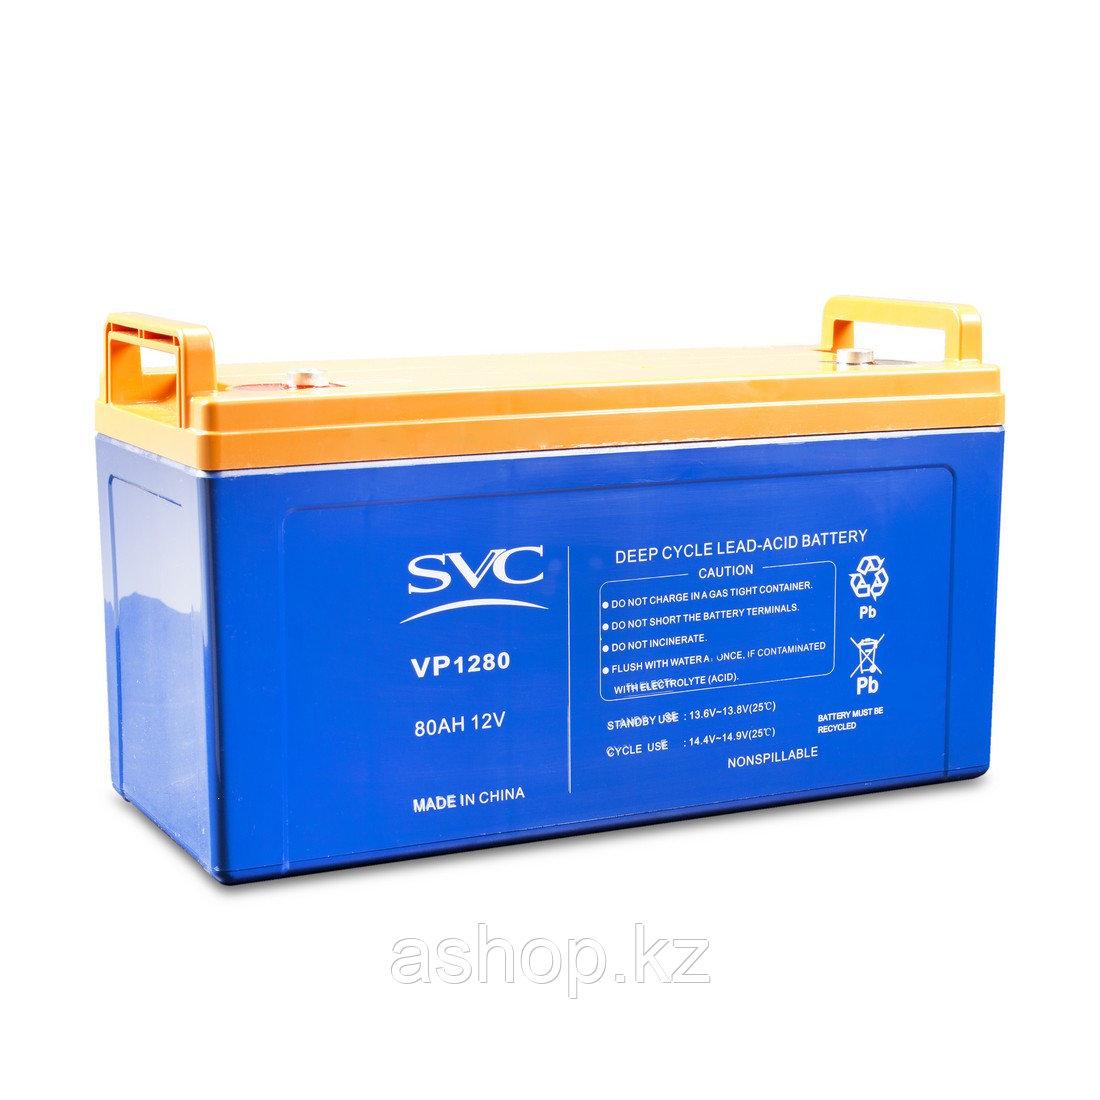 Батарея необслуживаемая (аккумулятор) SVC VP 1280 (12V 80 Ah), Емкость аккумулятора: 80 Ah, Разъемы: F5/F12